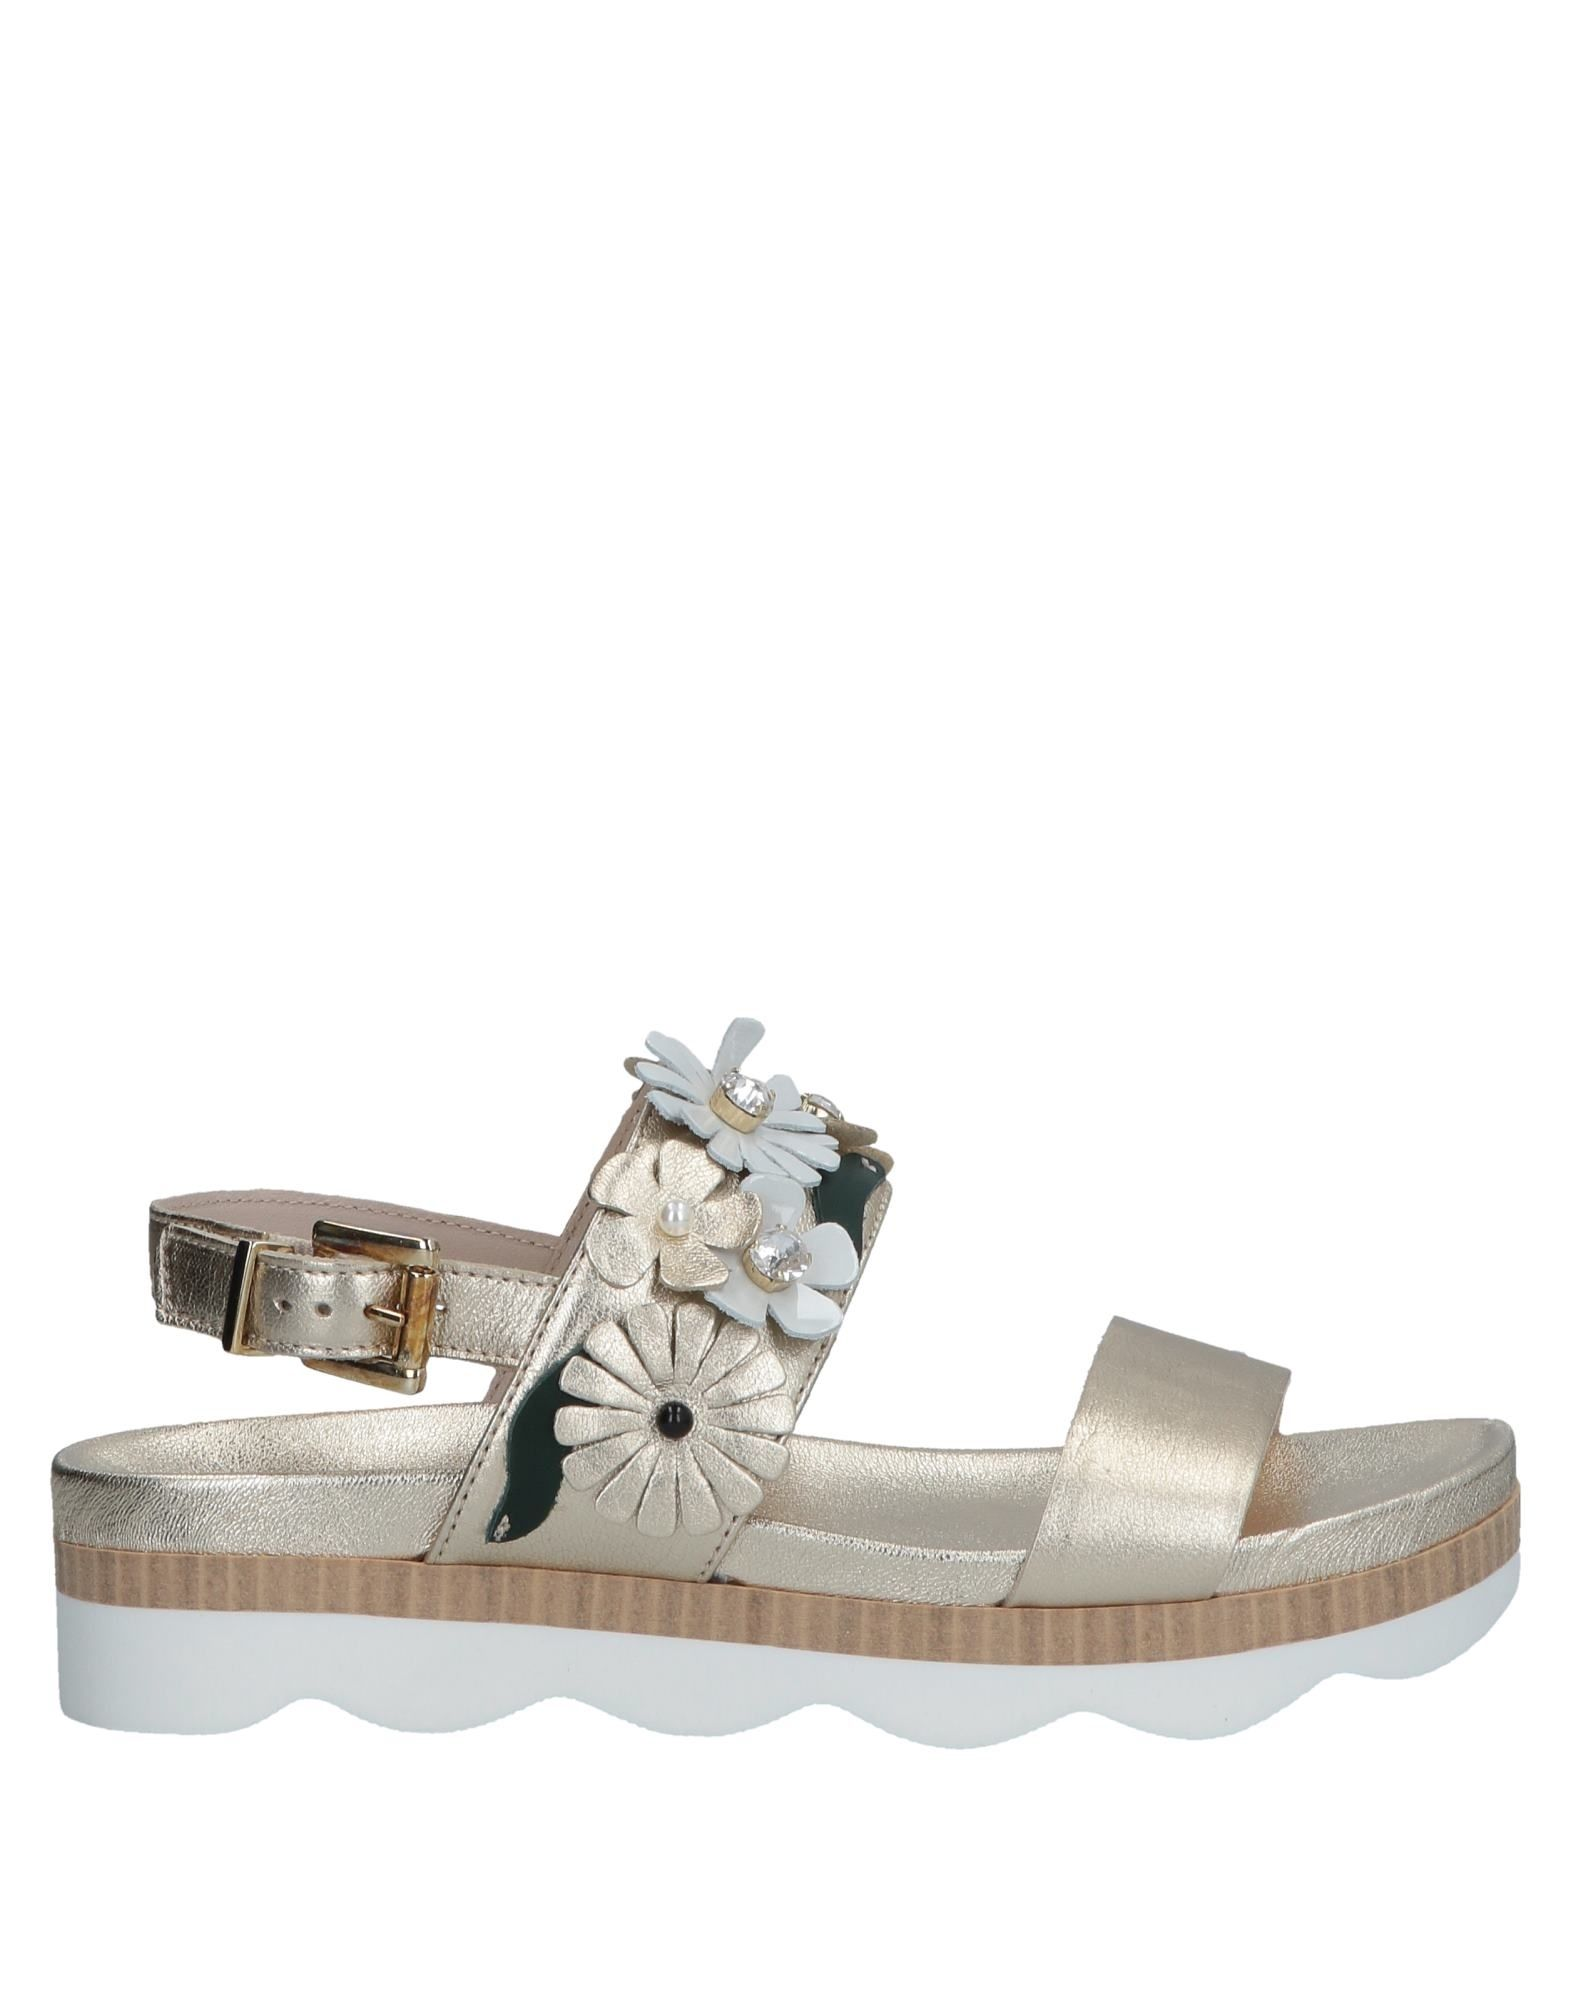 Tosca Blu Shoes Sandals - Women online Tosca Blu Shoes Sandals online Women on  United Kingdom - 11571644SF 5be221